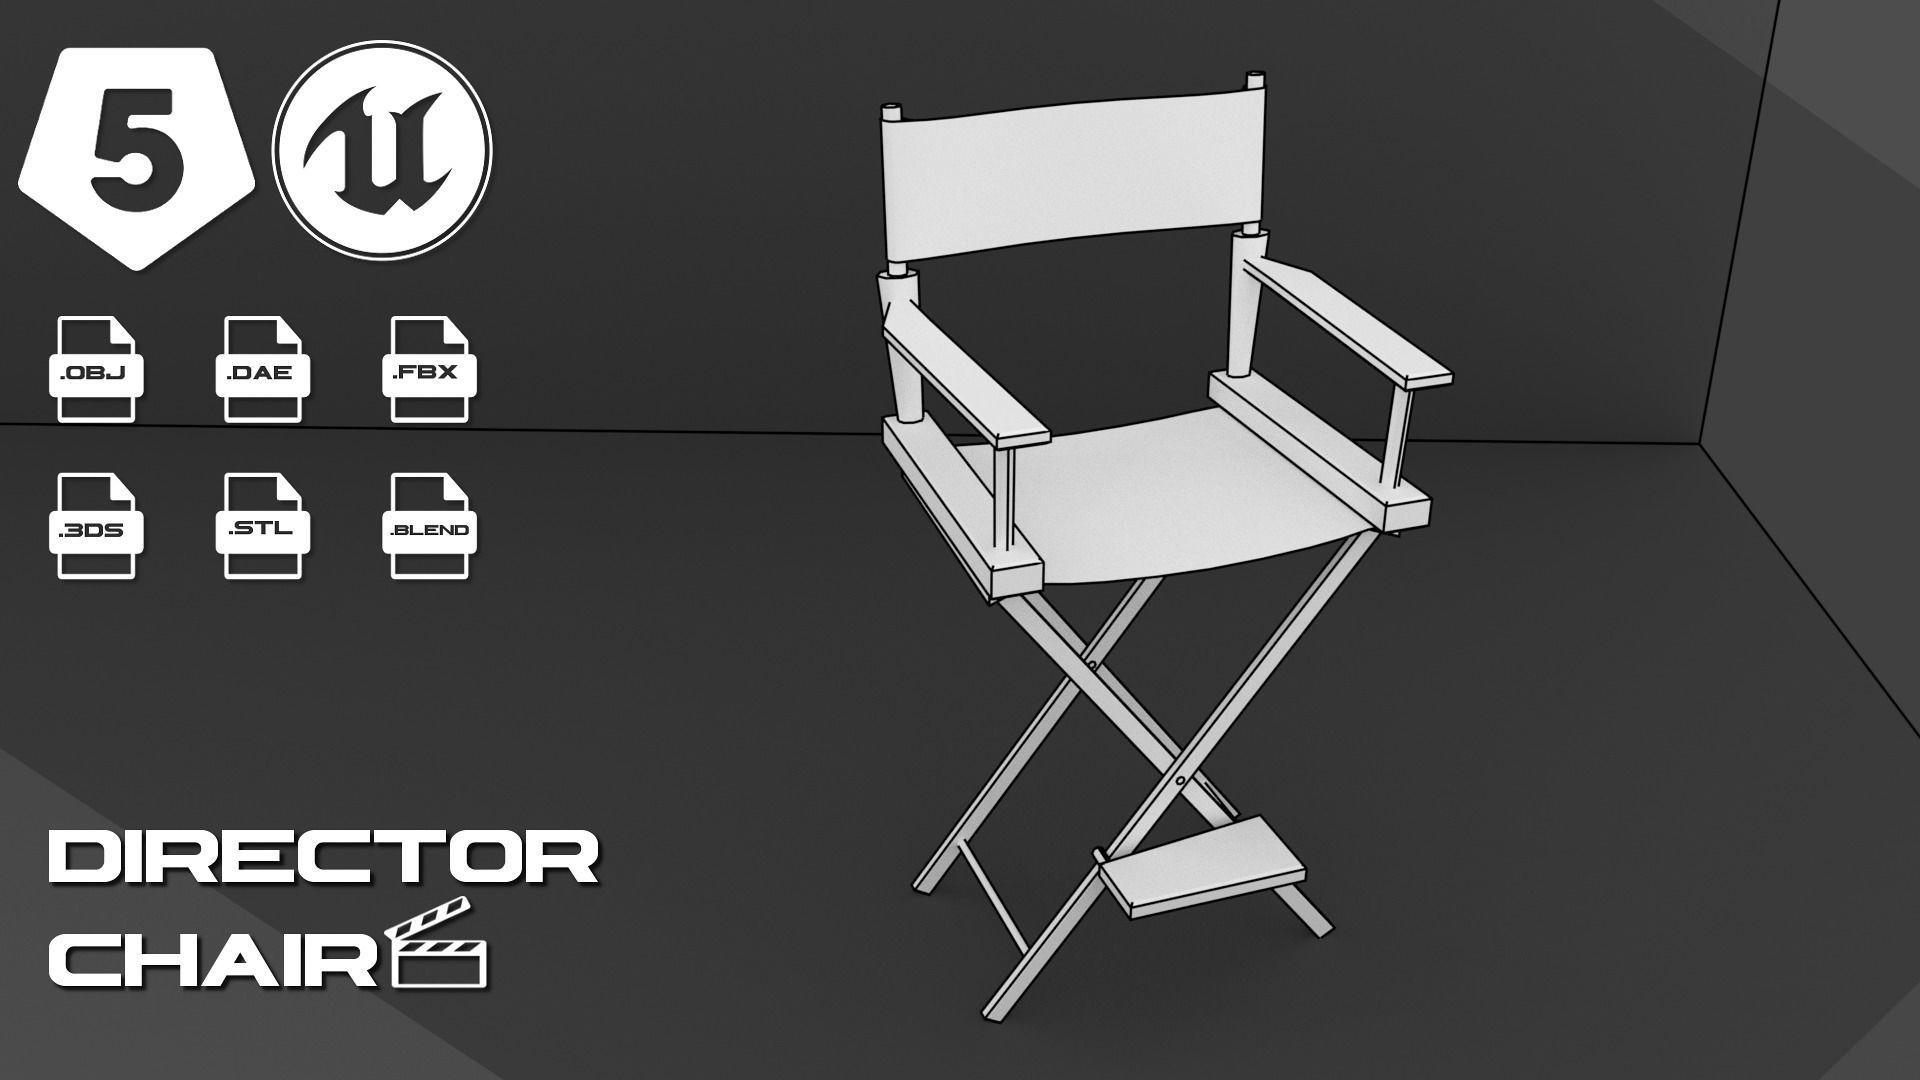 Director Chair 3d Model Obj 3ds Fbx Stl Blend Dae 4